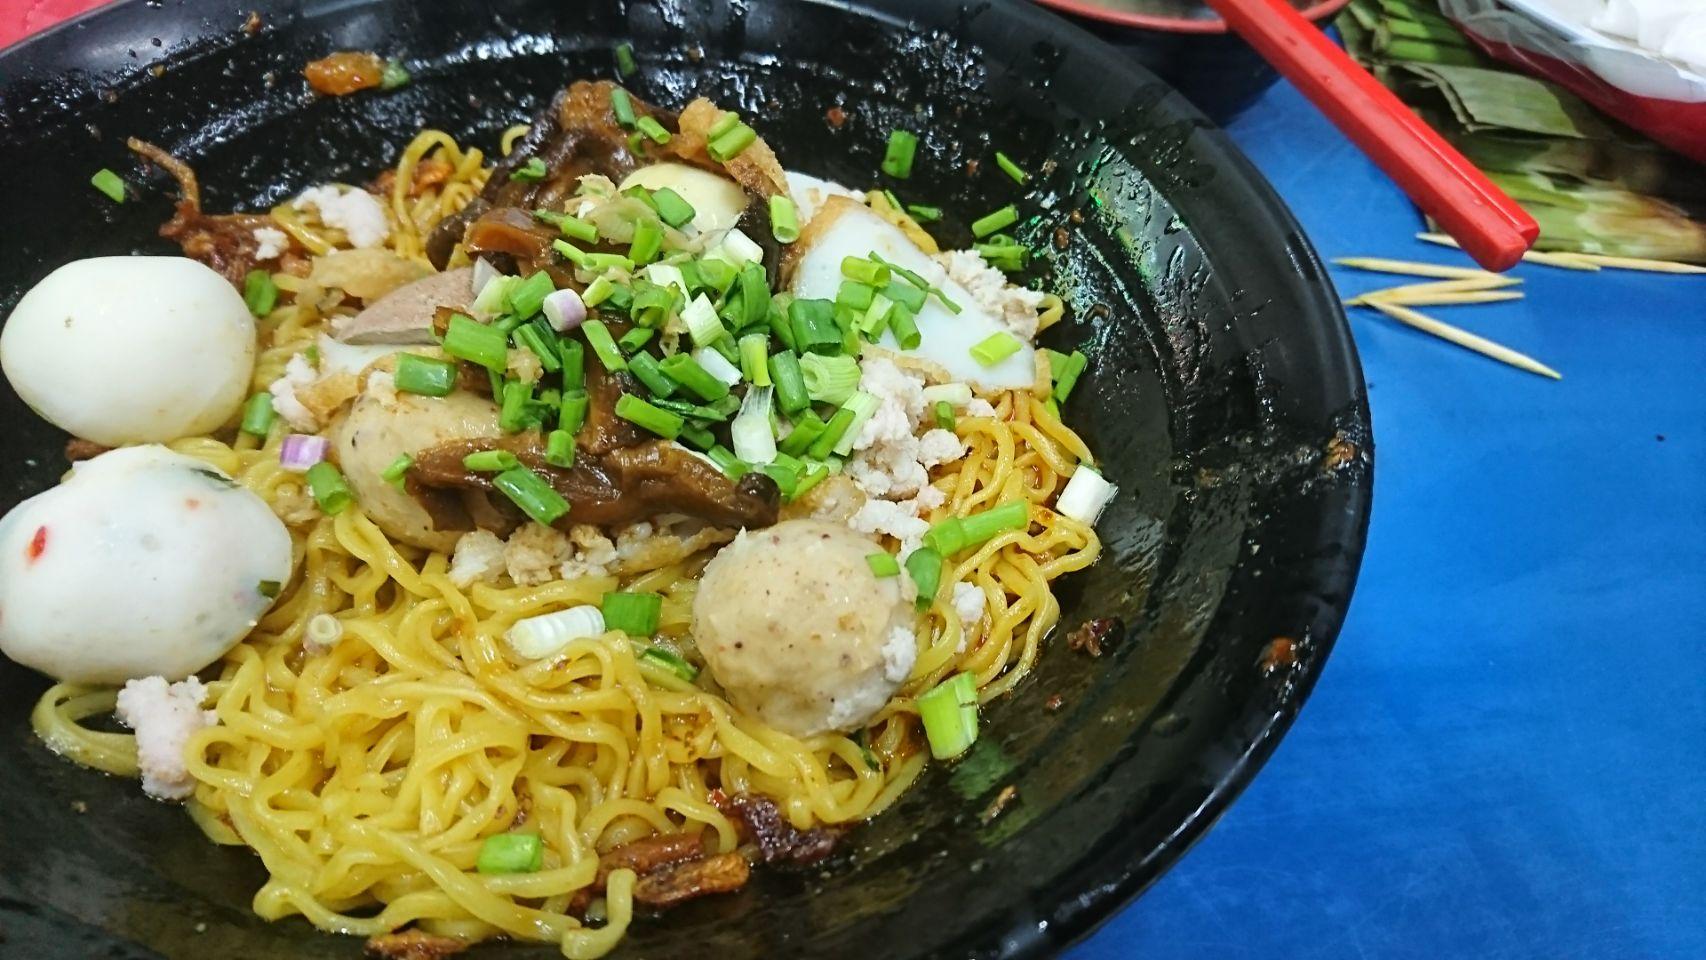 What A Legendary Bowl Of Noodles!!